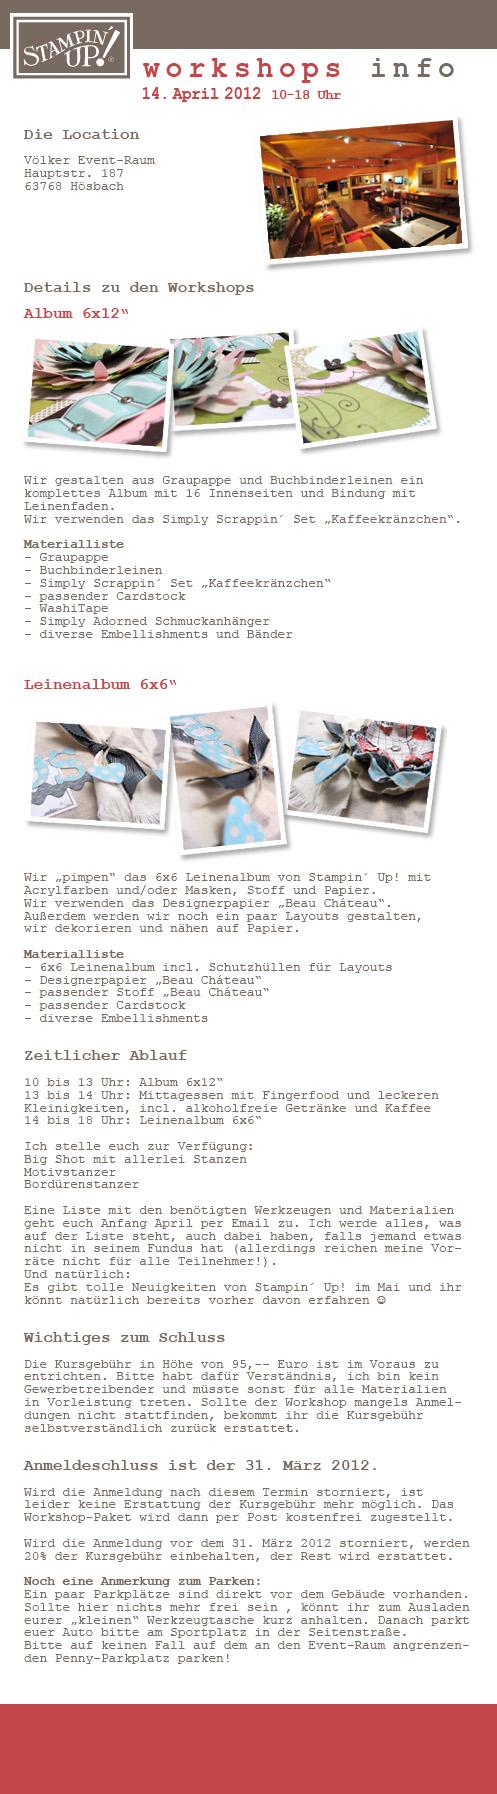 Web_info_497x1749